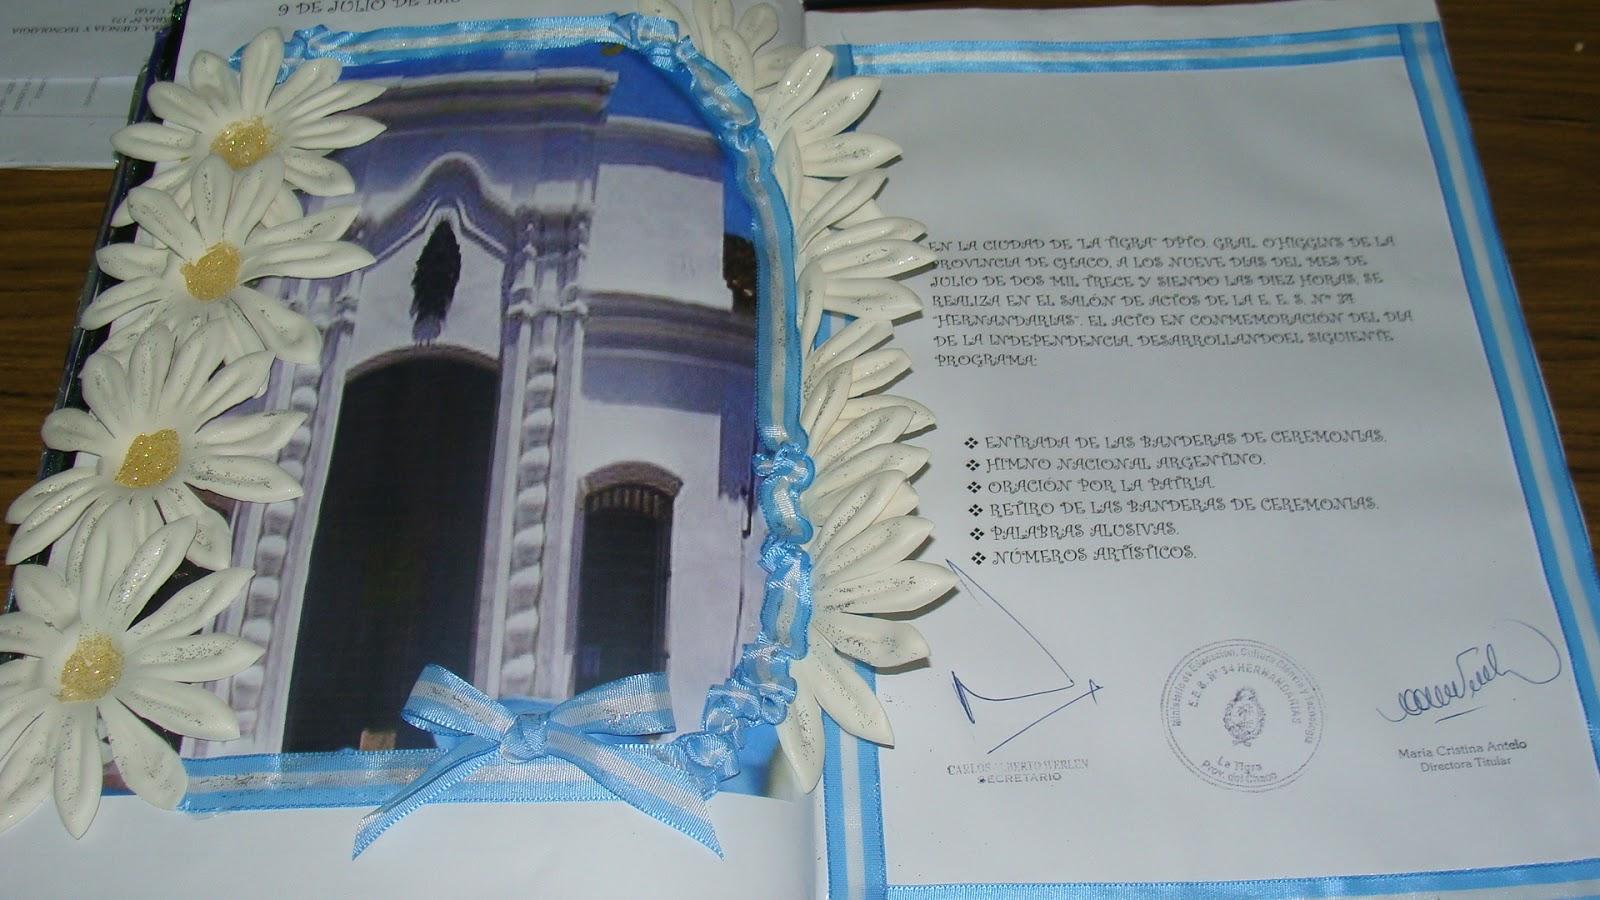 Escuela de educaci n secundaria n 34 hernandarias for Decoracion 9 de julio secundaria